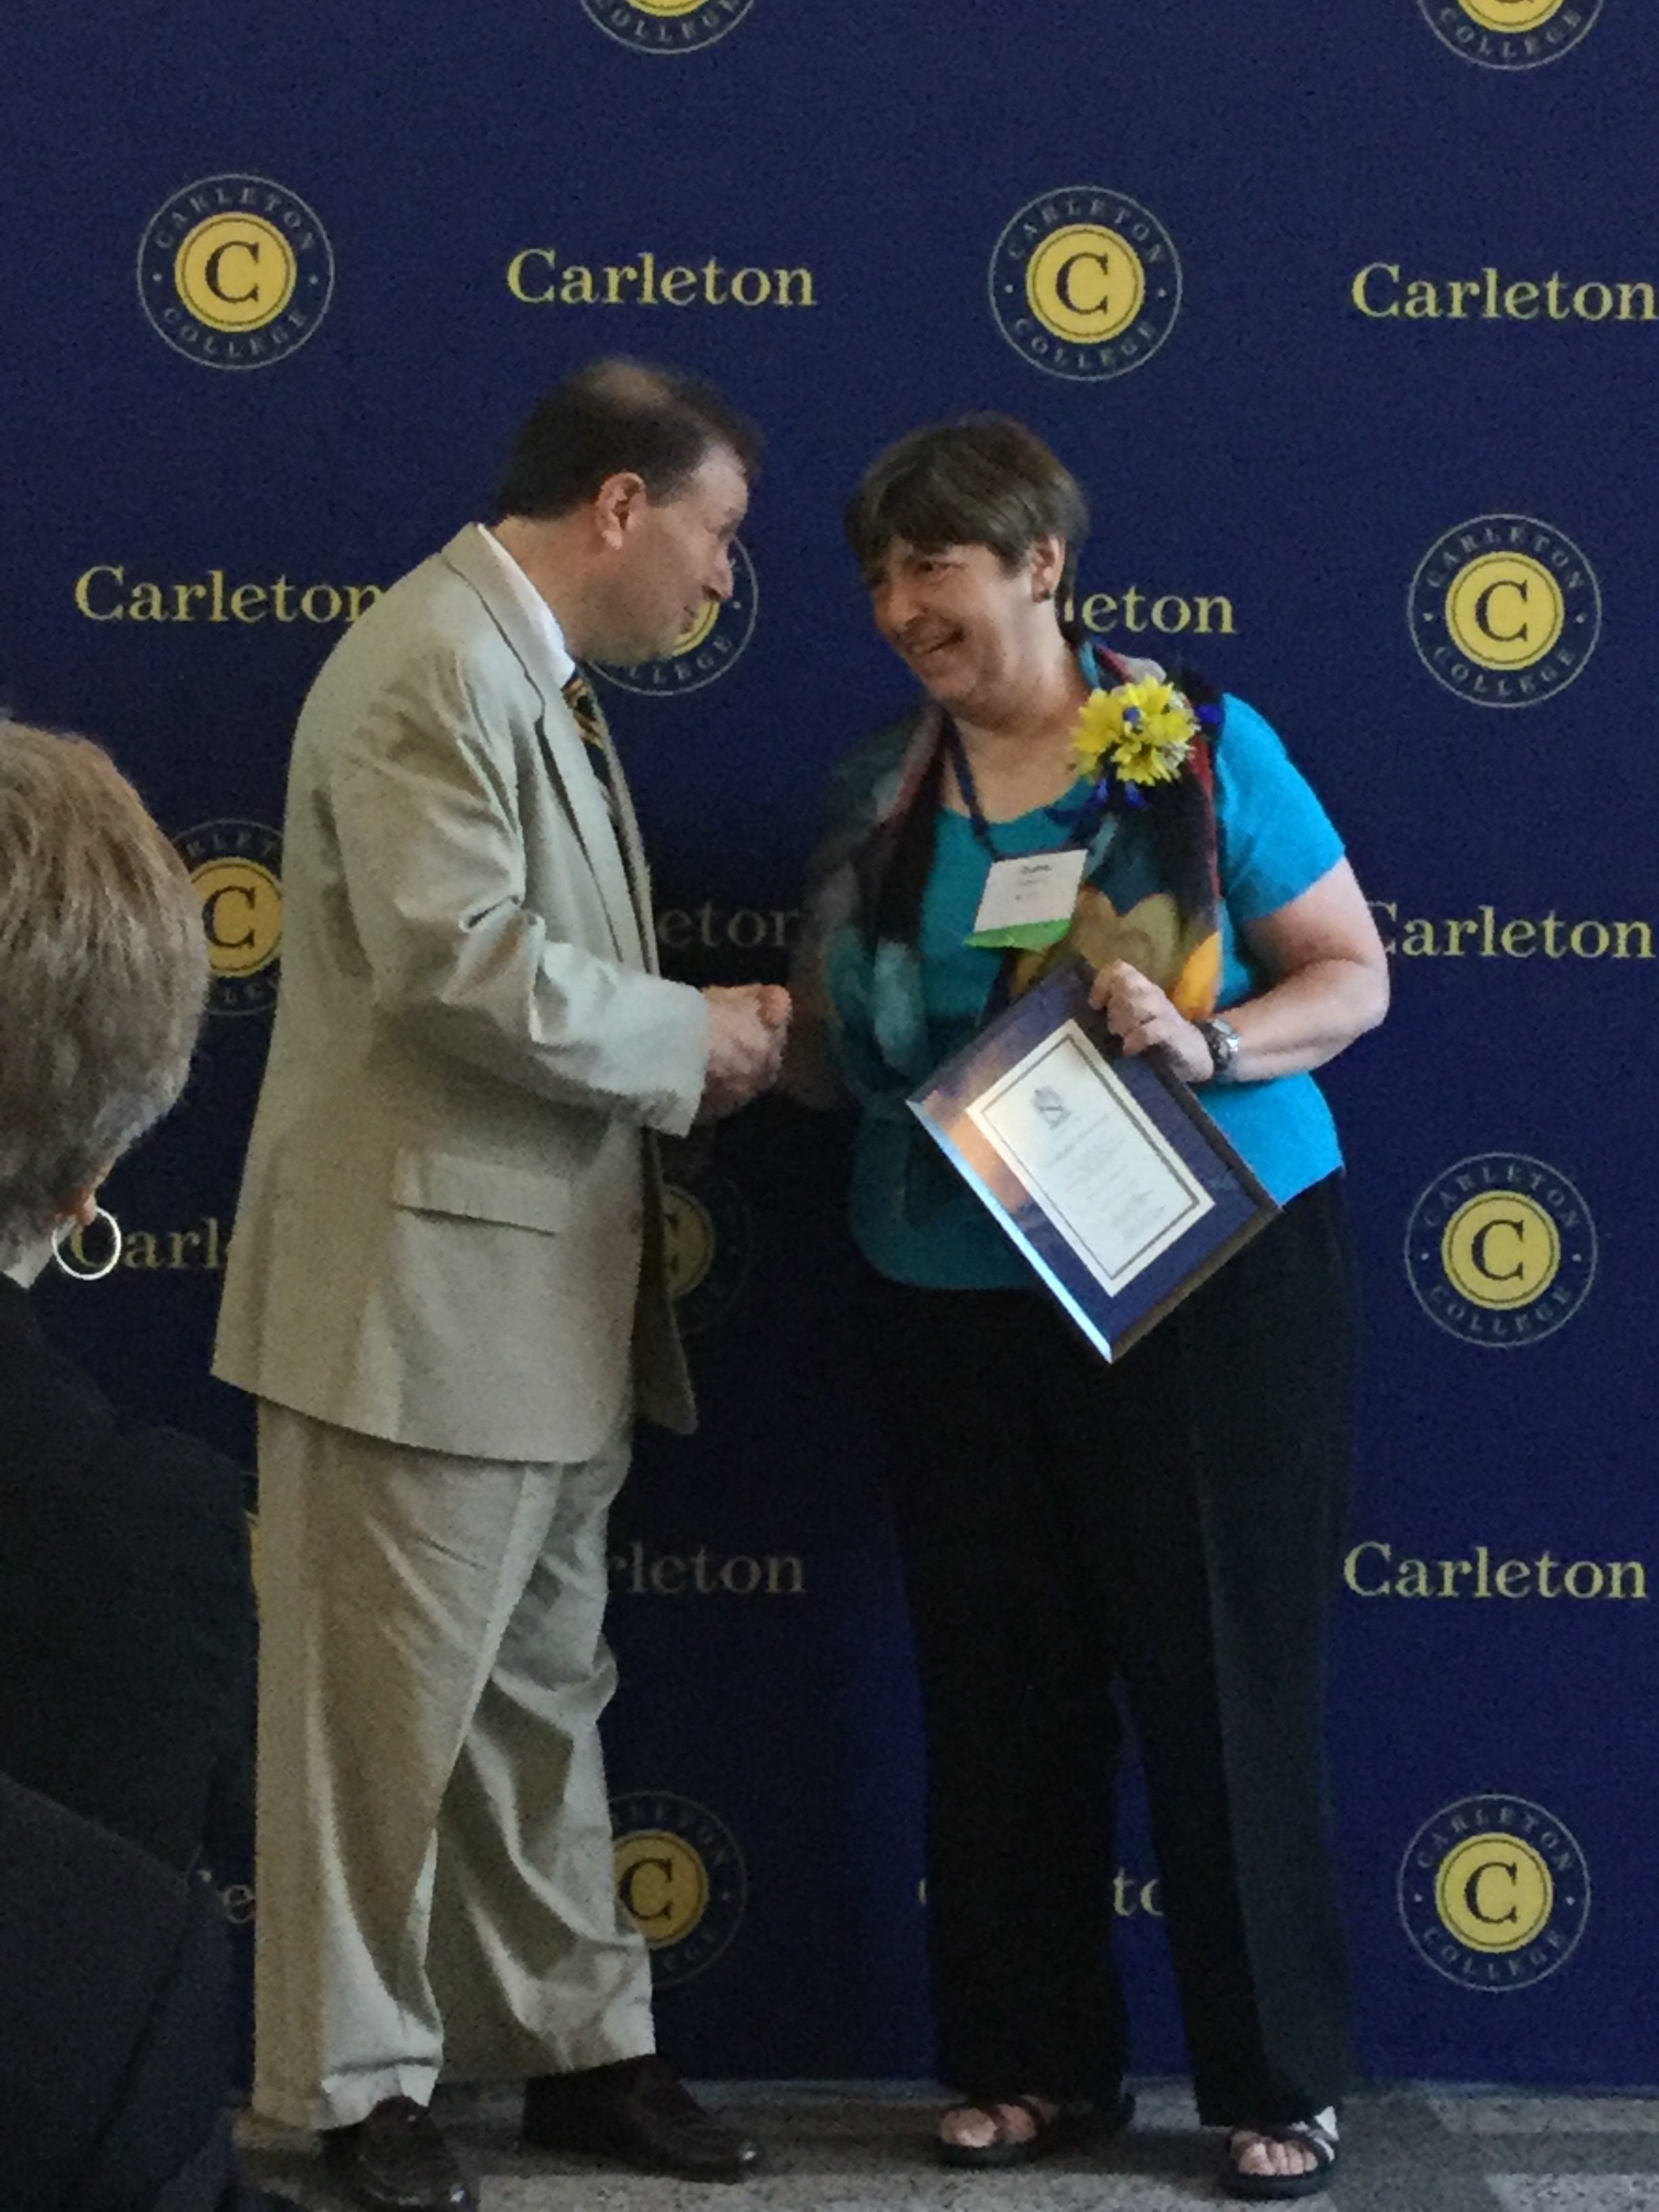 Diane Redleaf received the (Carleton College Distinguished Alumni Achievement Award Celebration in June 2016